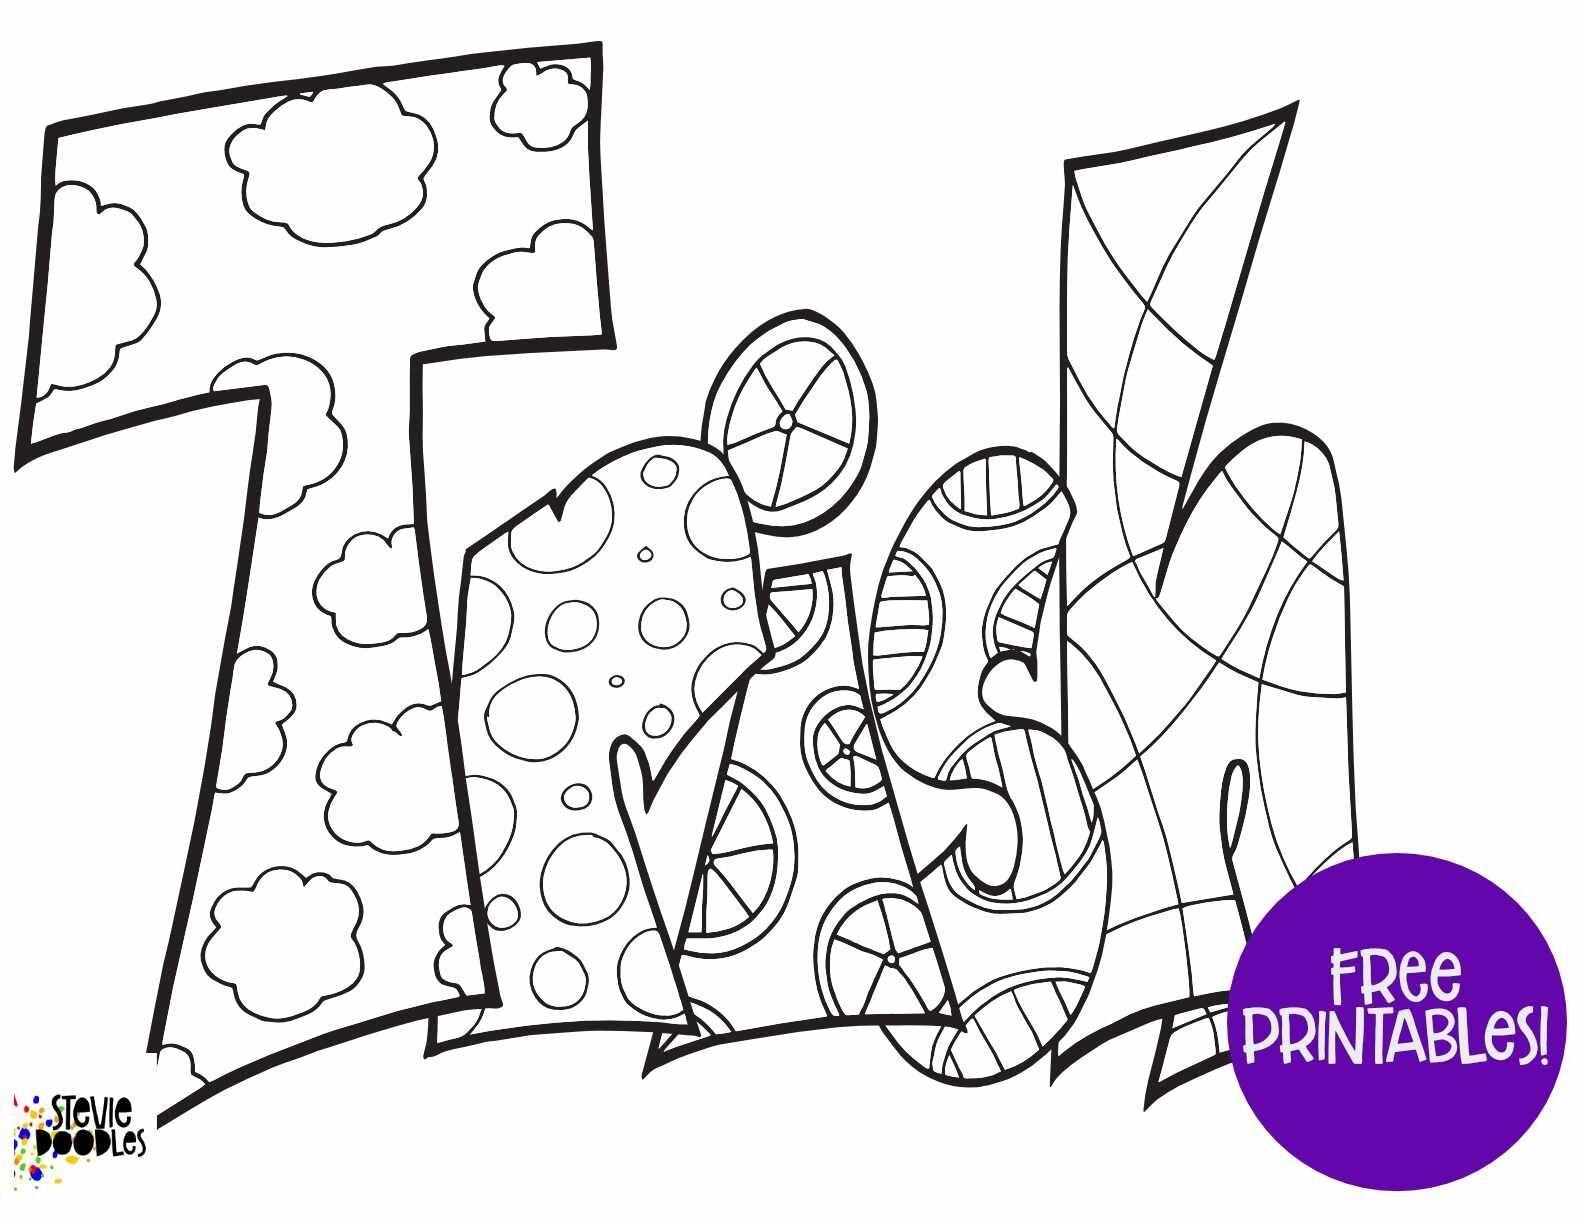 Trish Free Custom Name Printable Coloring Page Stevie Doodles Free Printable Coloring Pages Printable Coloring Pages Free Kids Coloring Pages